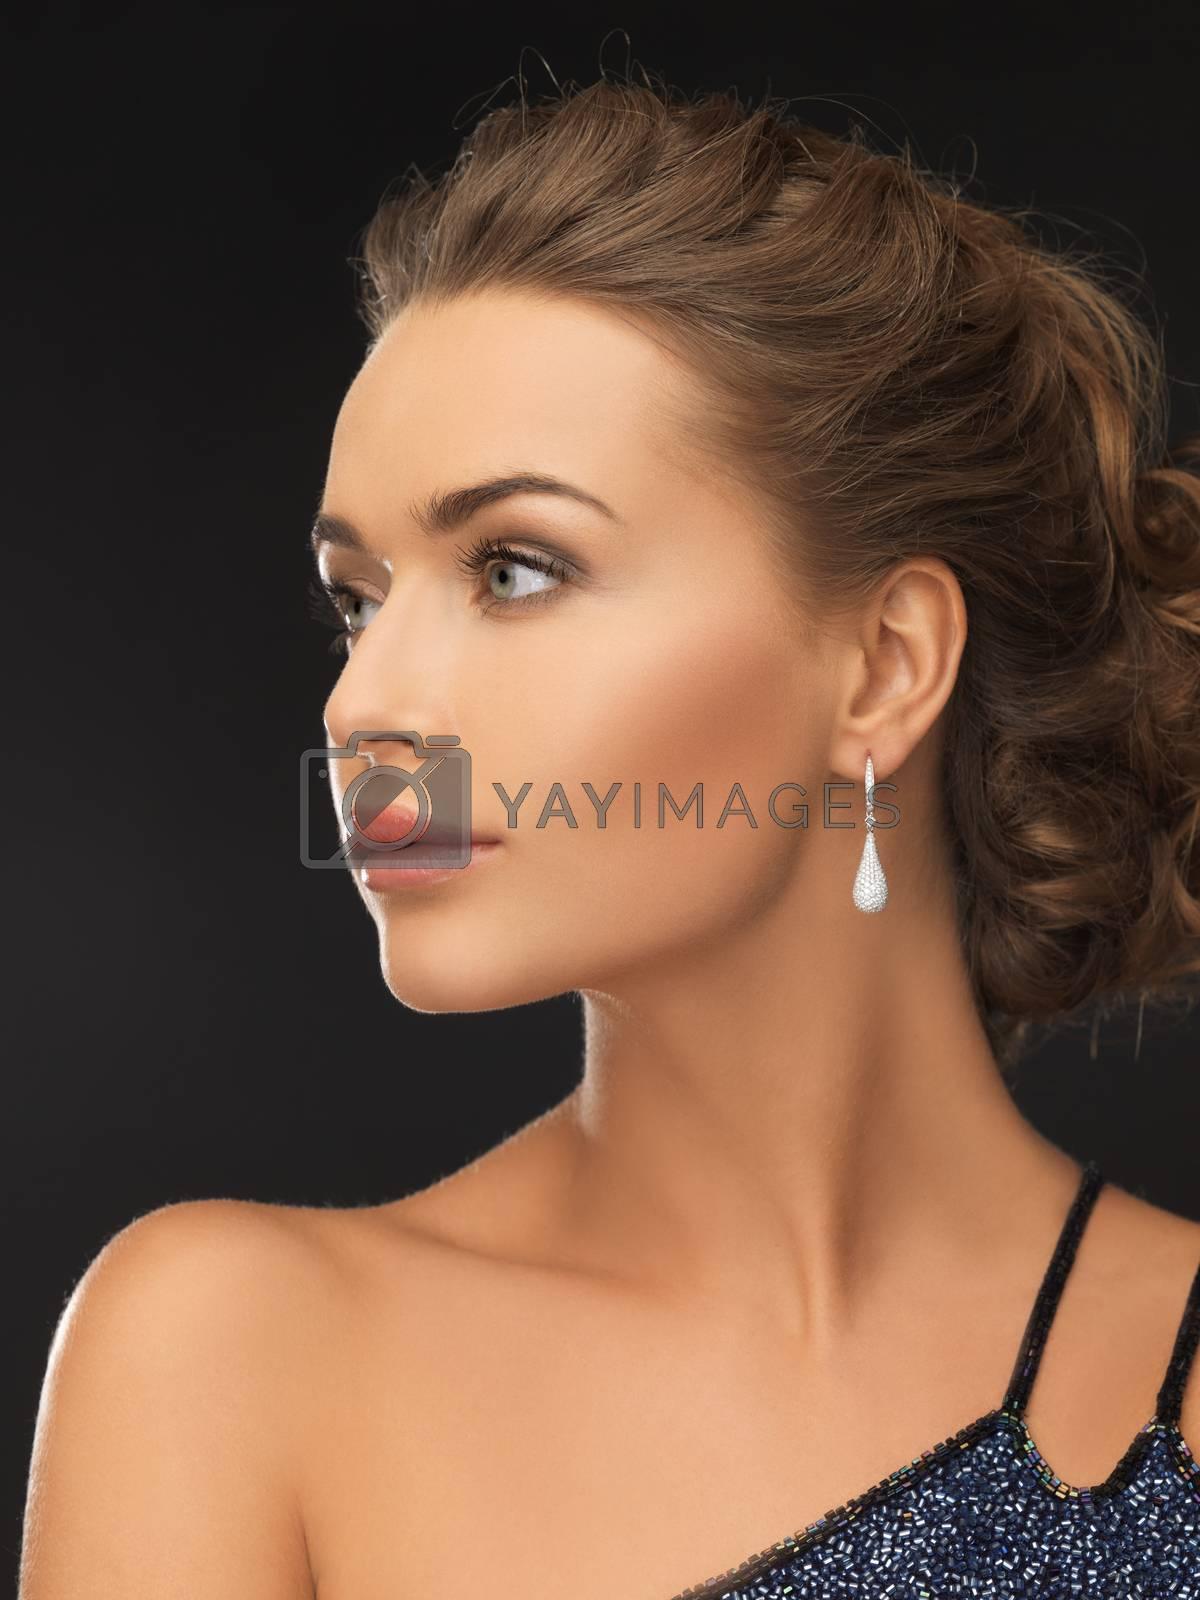 woman with diamond earrings by dolgachov